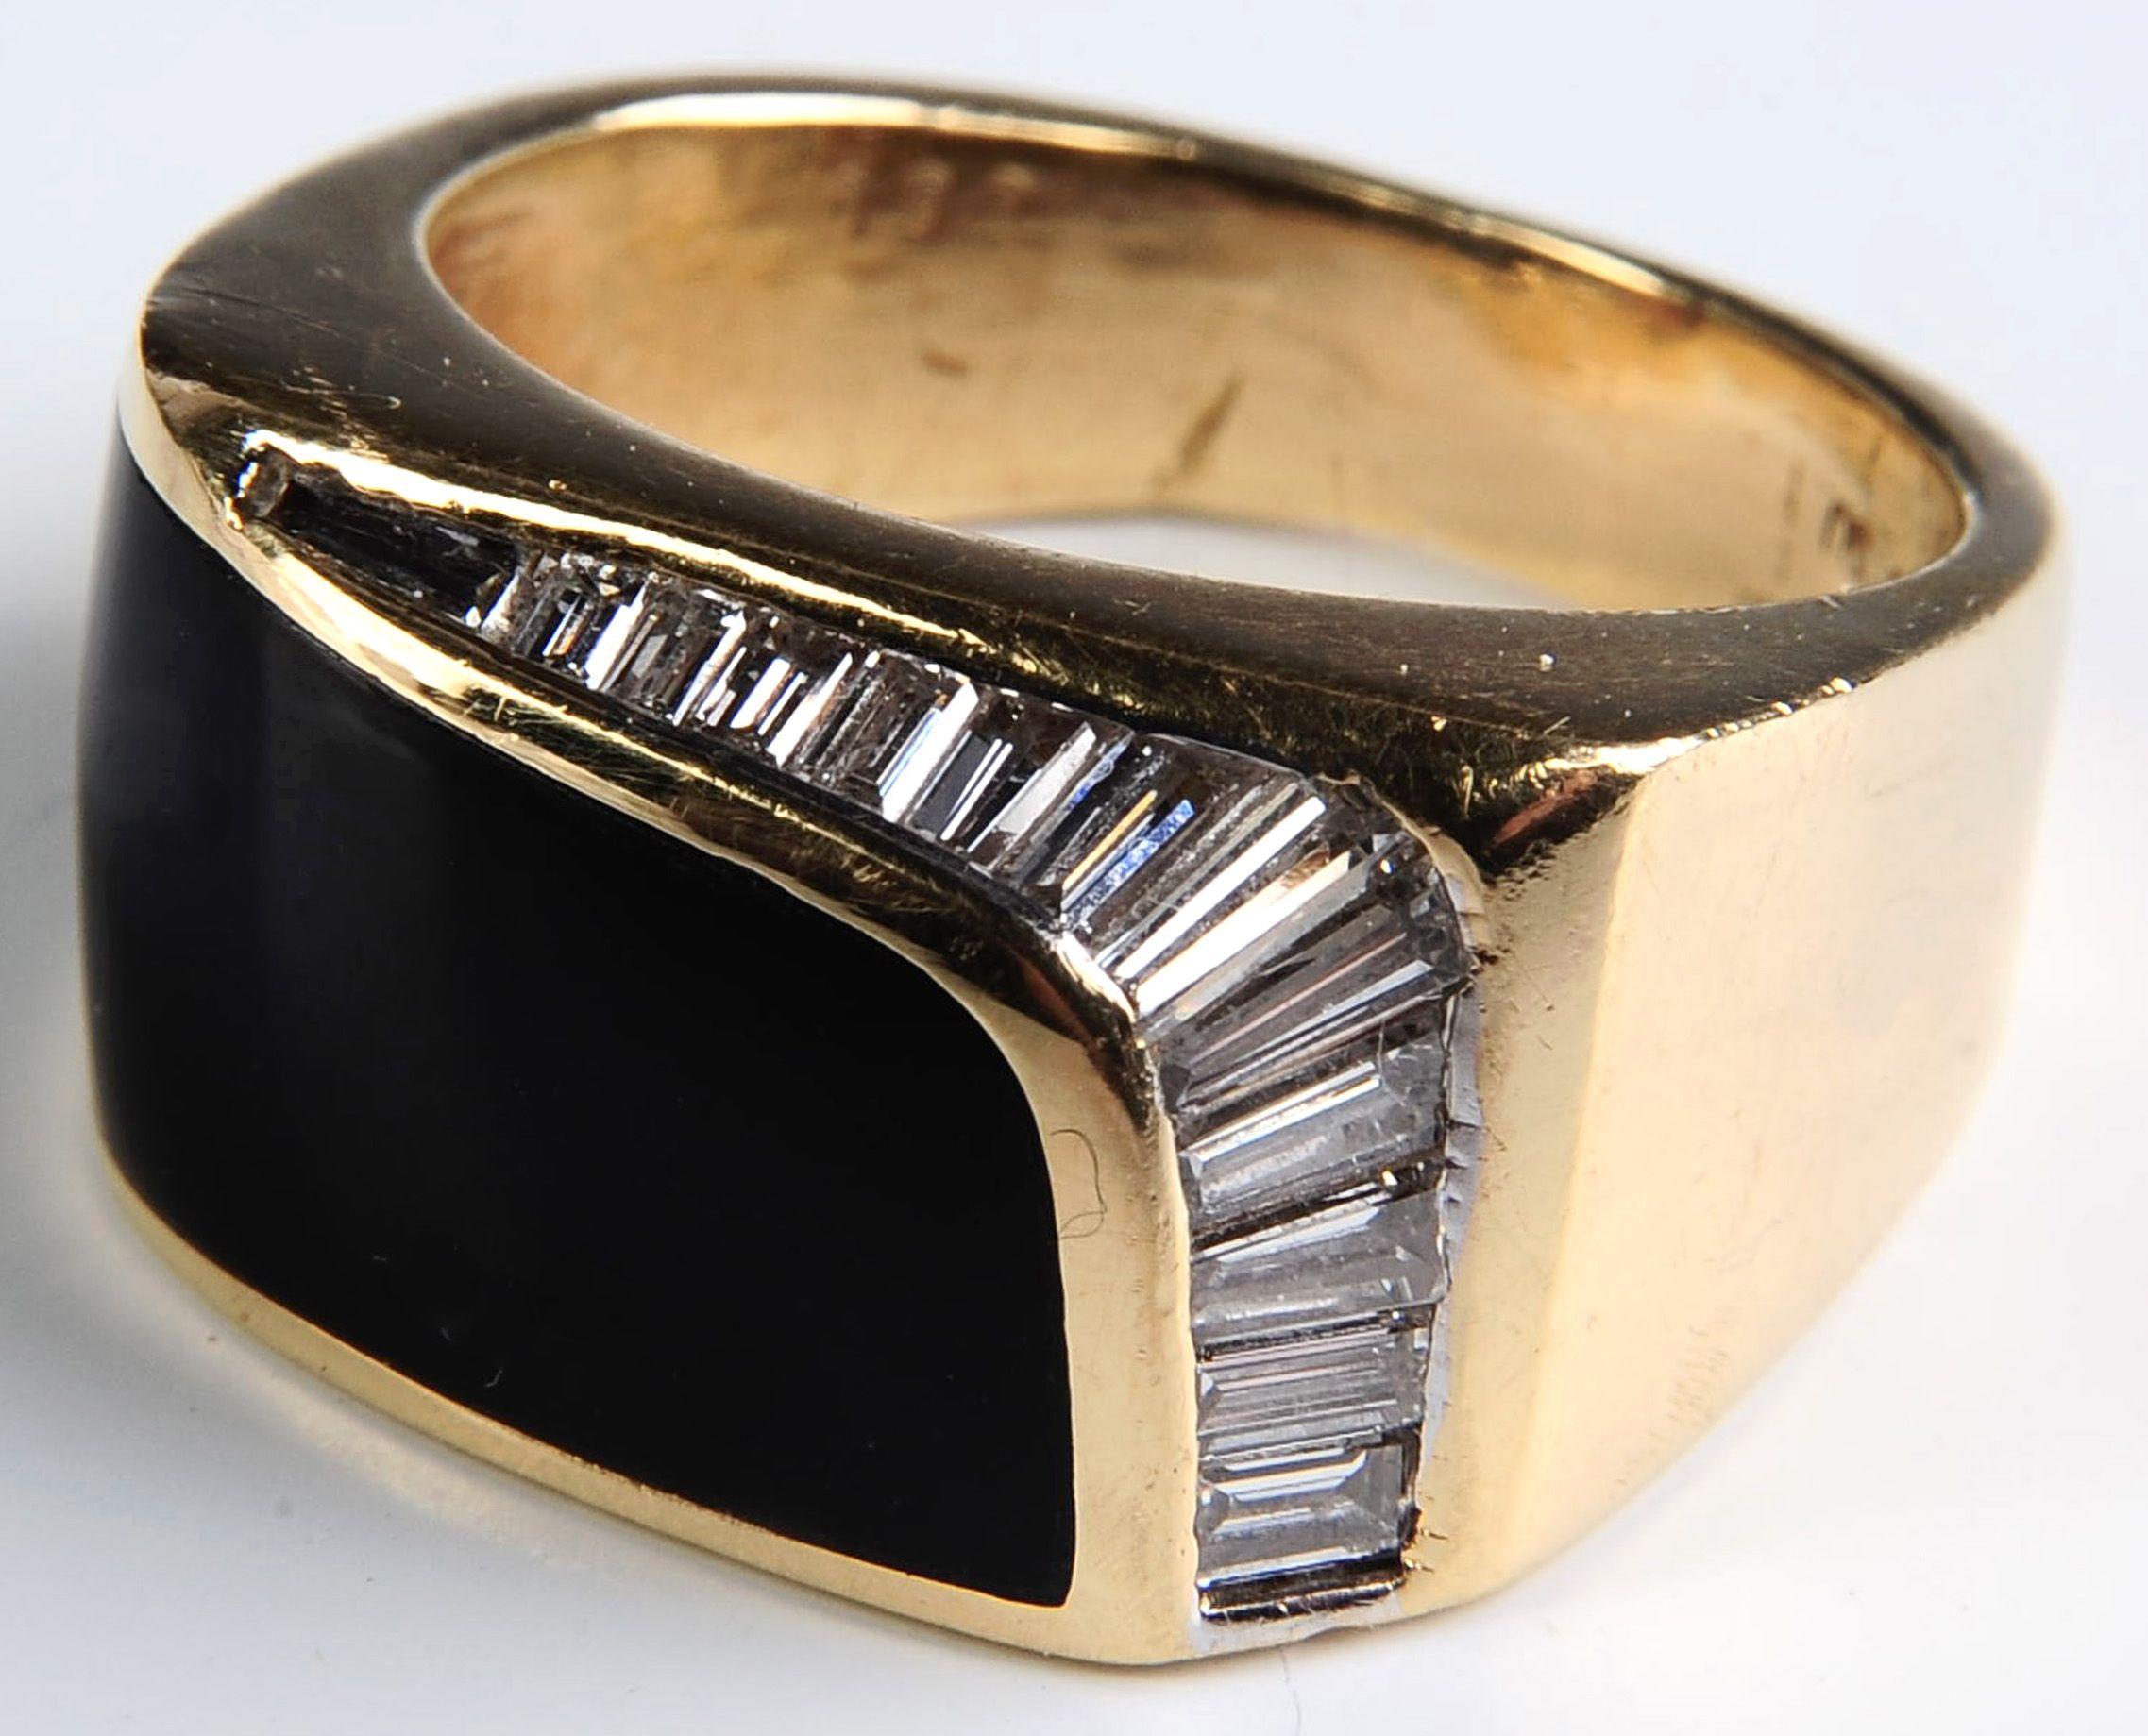 a gentu0027s 18k gold onyx and baguette diamond ring a sleek gentu0027s ring with